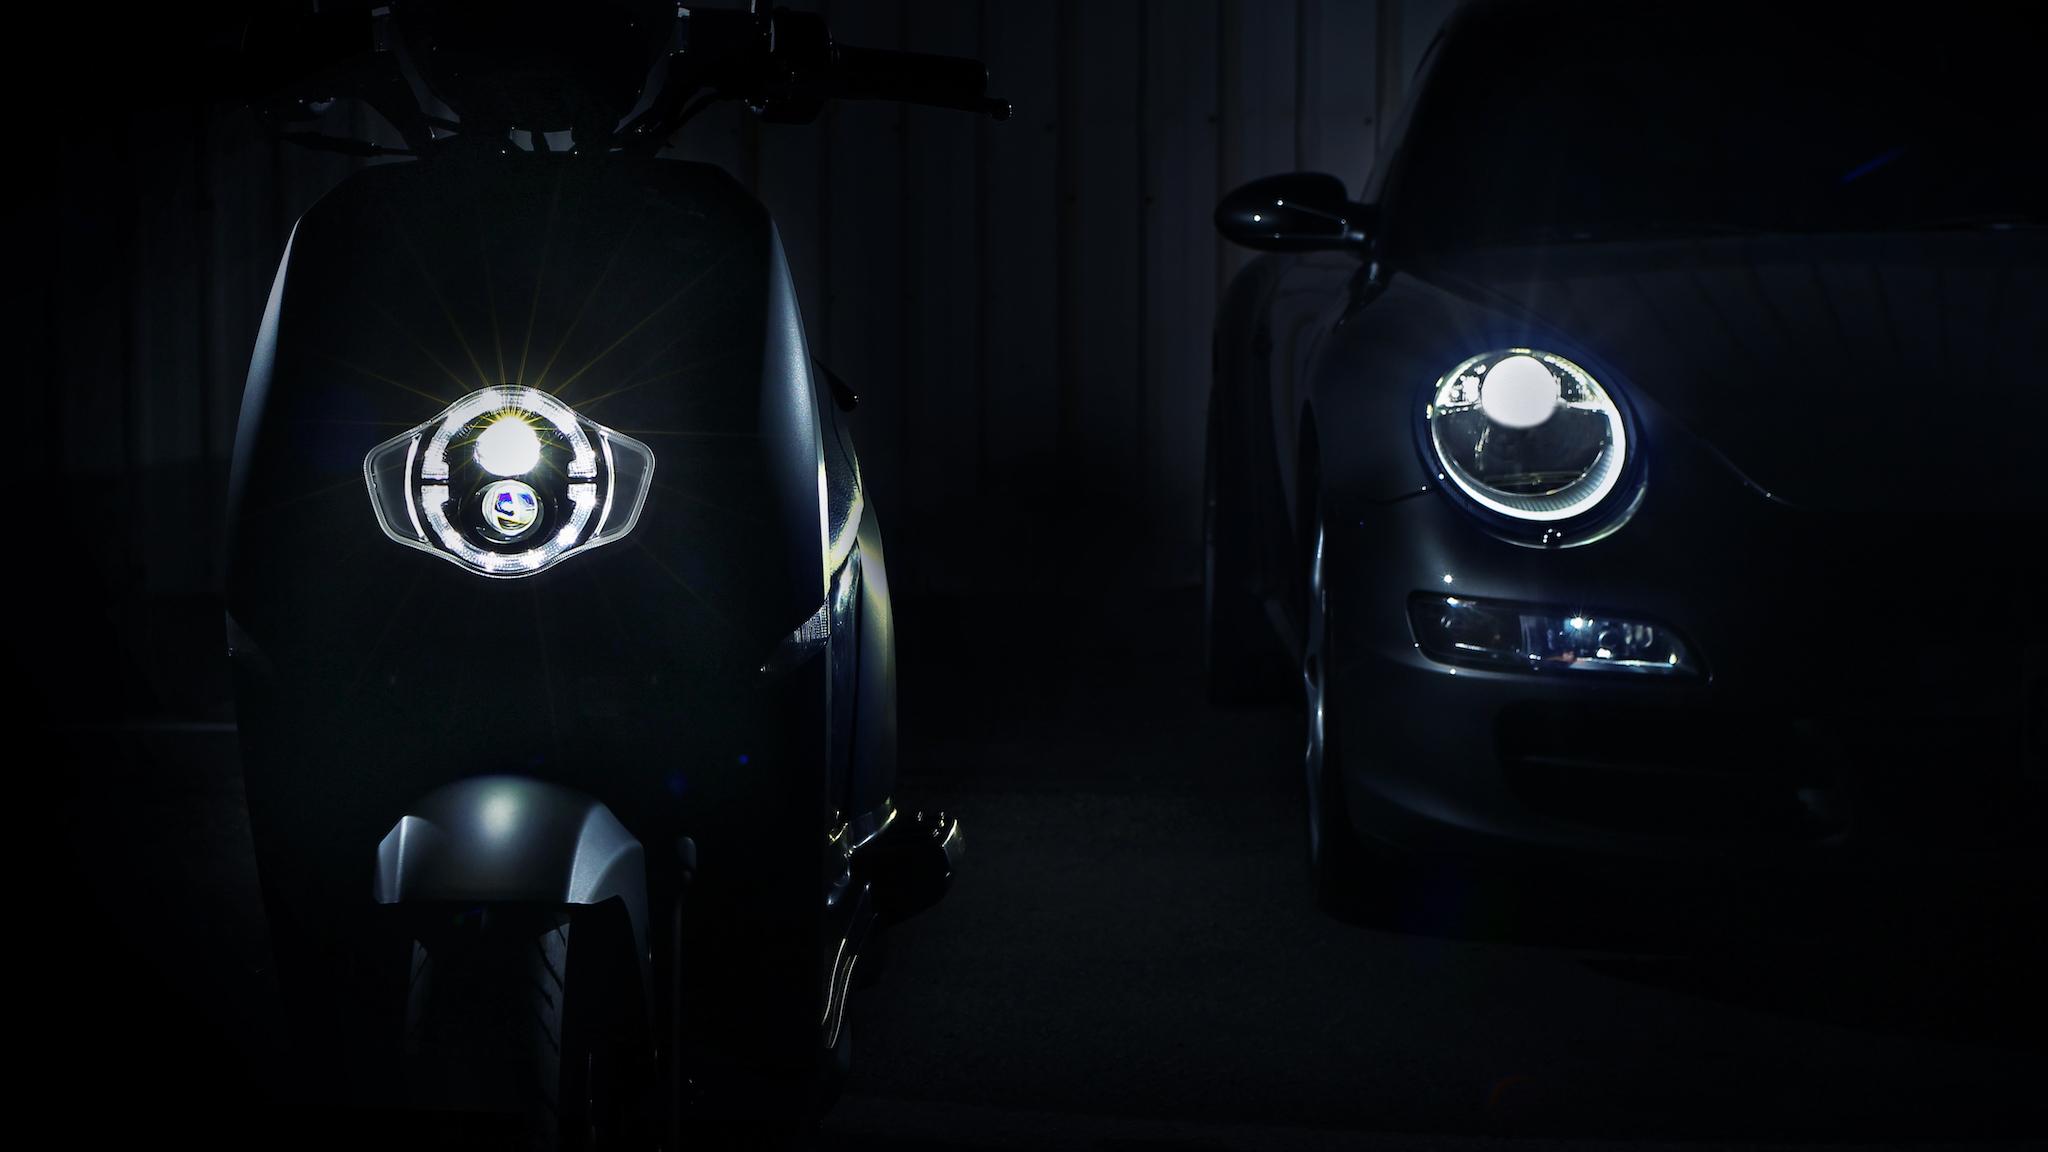 eReady 智慧雙輪公布 LED 圓燈造型